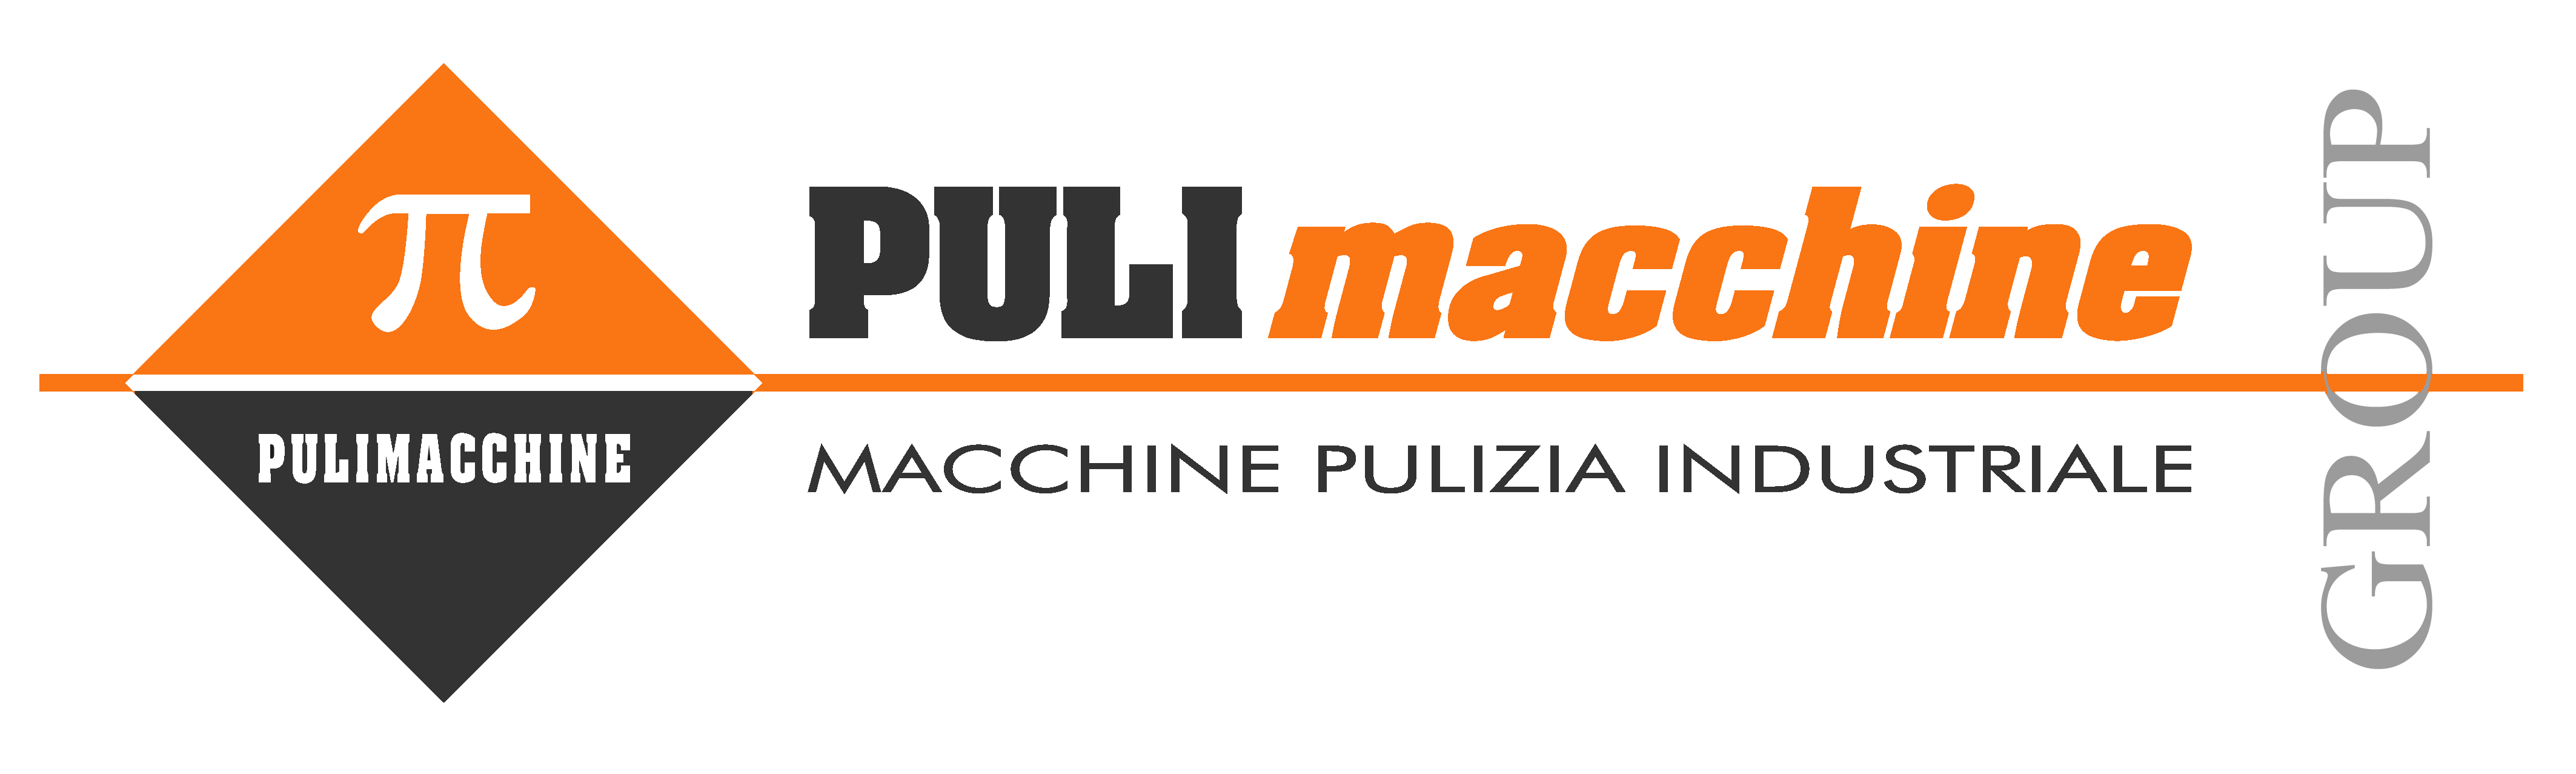 Pulimacchine – Macchine Pulizia Industriale